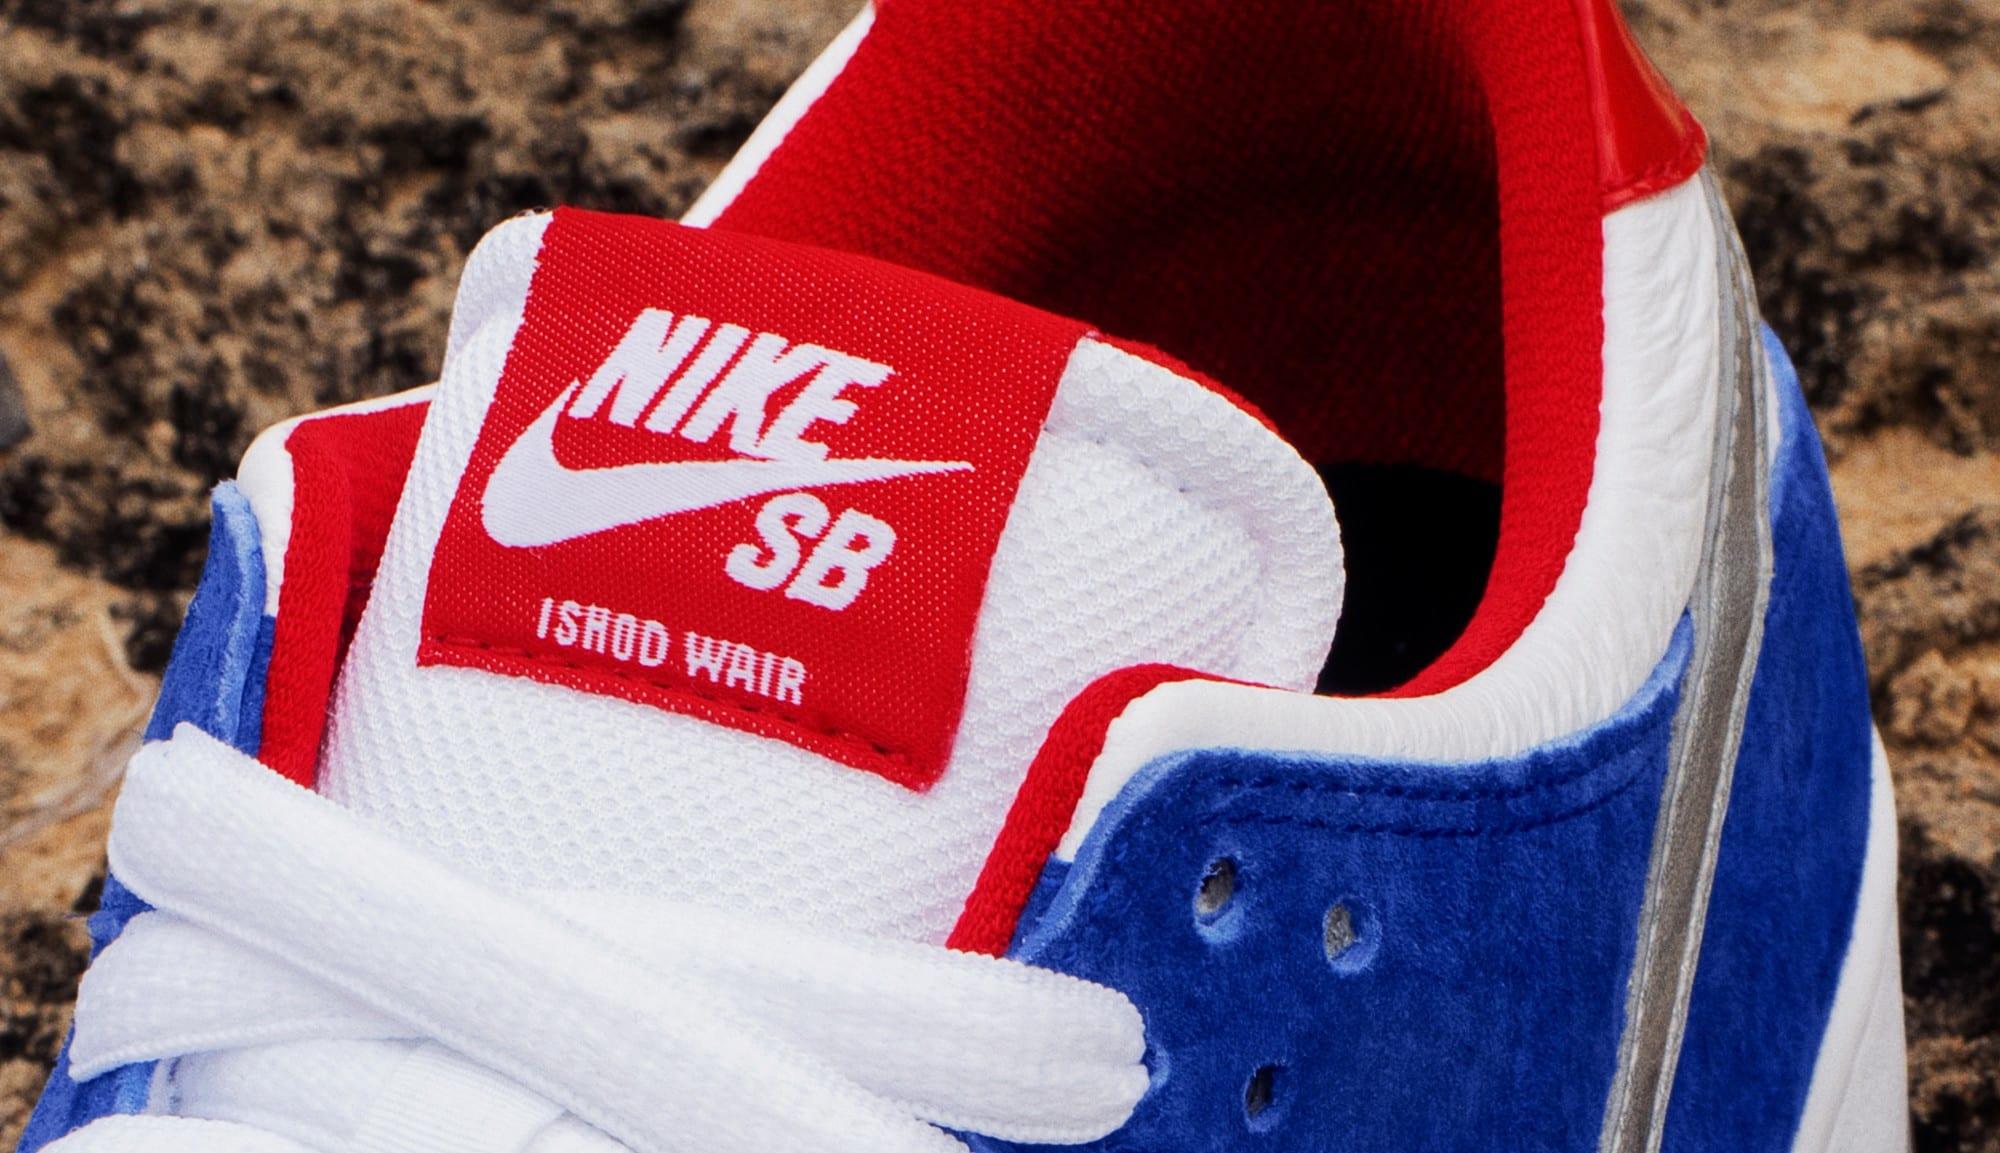 wholesale dealer d1dc0 53ee2 Nike SB Ishod Wair Dunk Quick Strike - 2/11/16 | Tactics